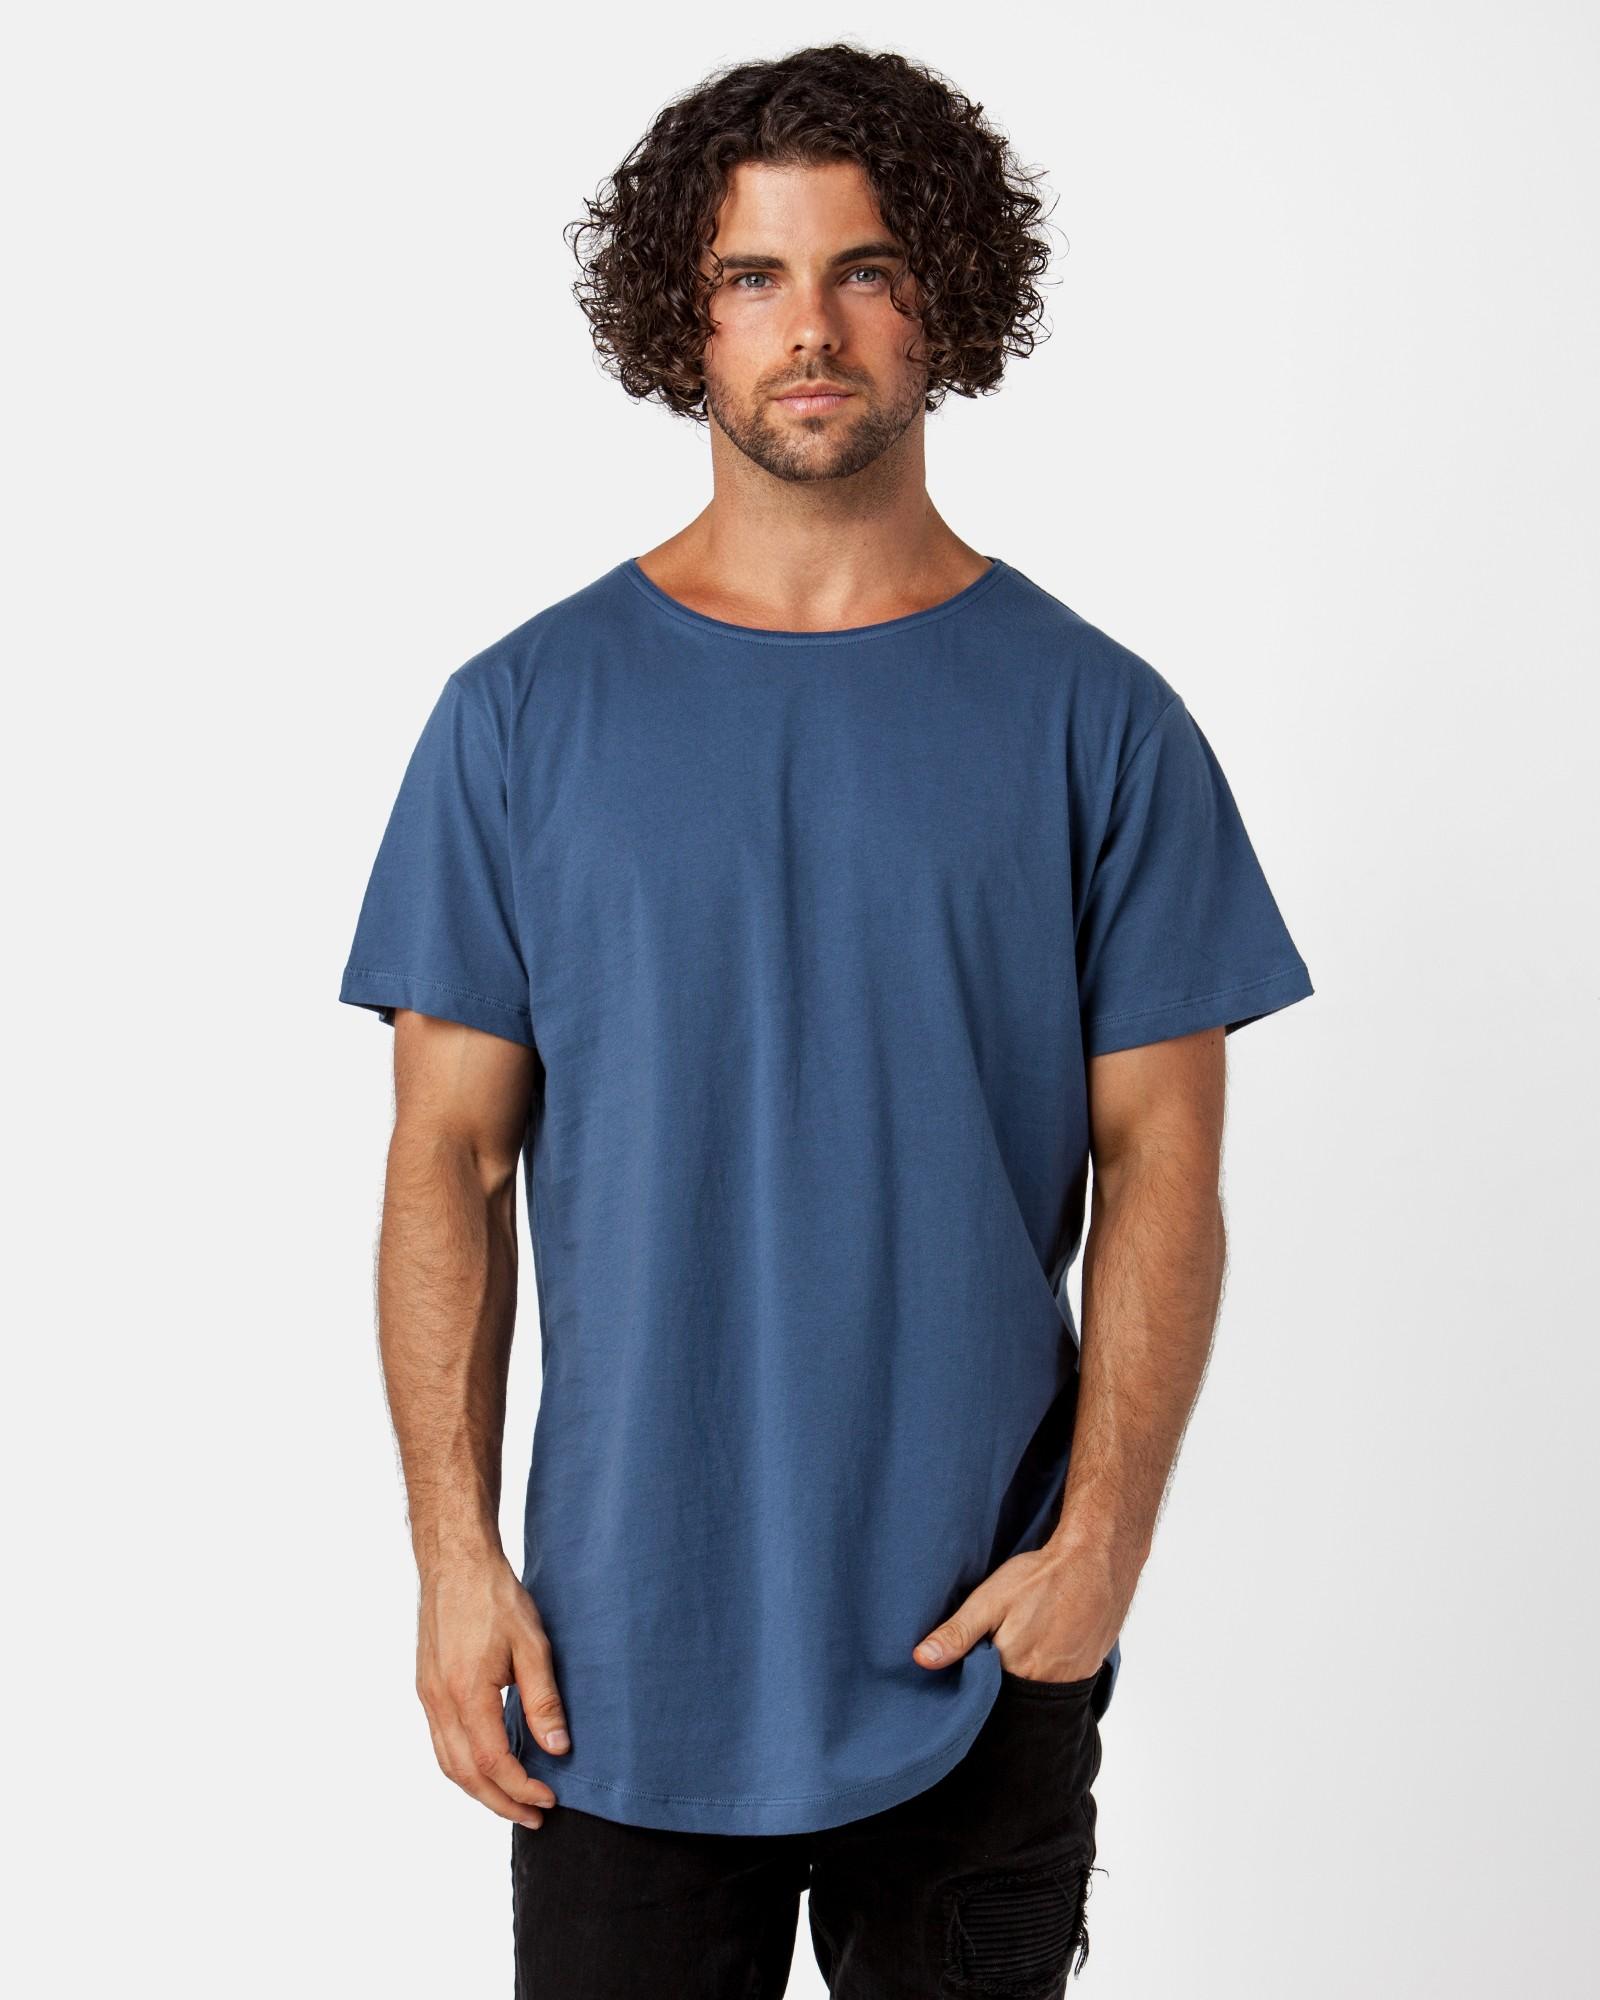 CLASSIC BLUE TEE